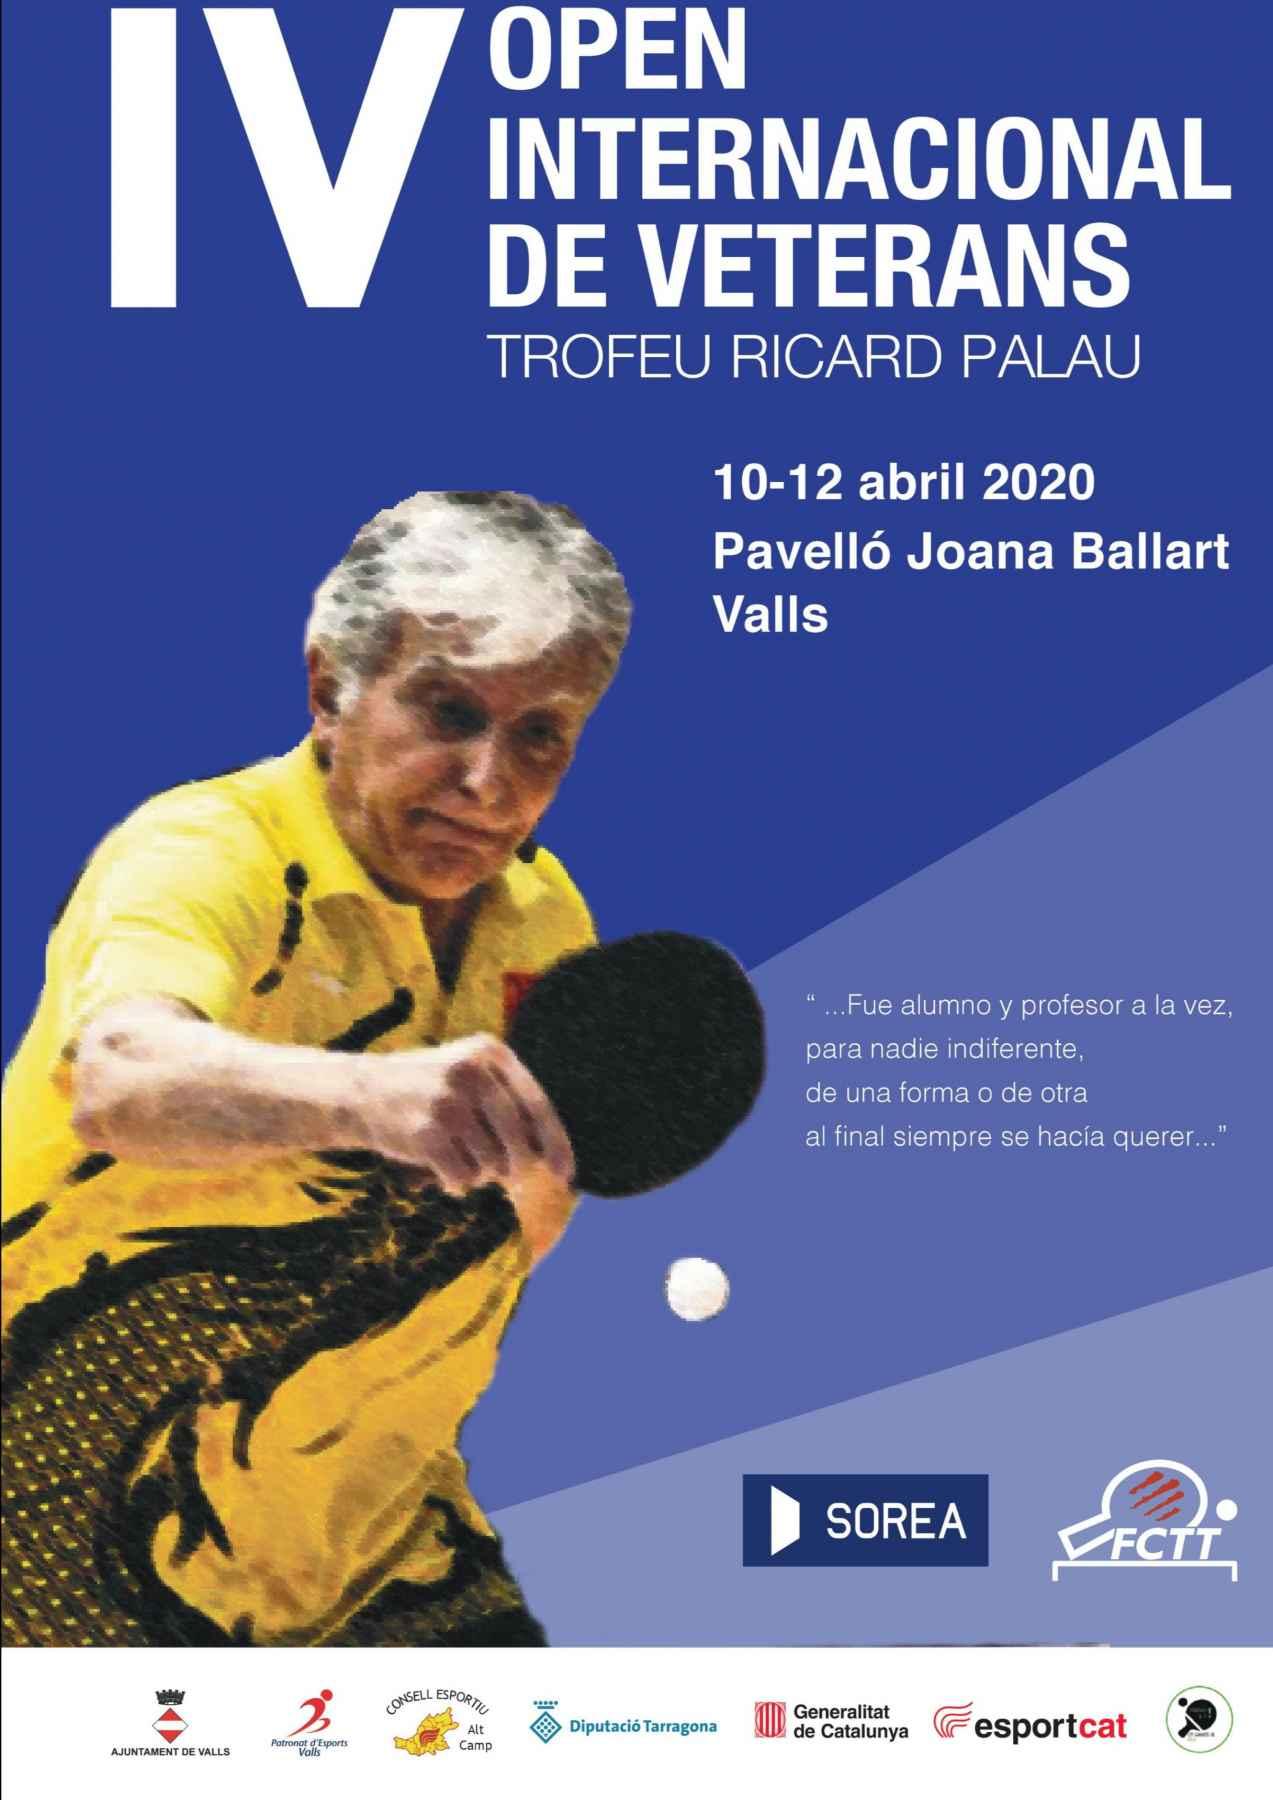 Cartel Torneo Internacional de Veteranos Costa Dorada-Trofeo Ricard Palau